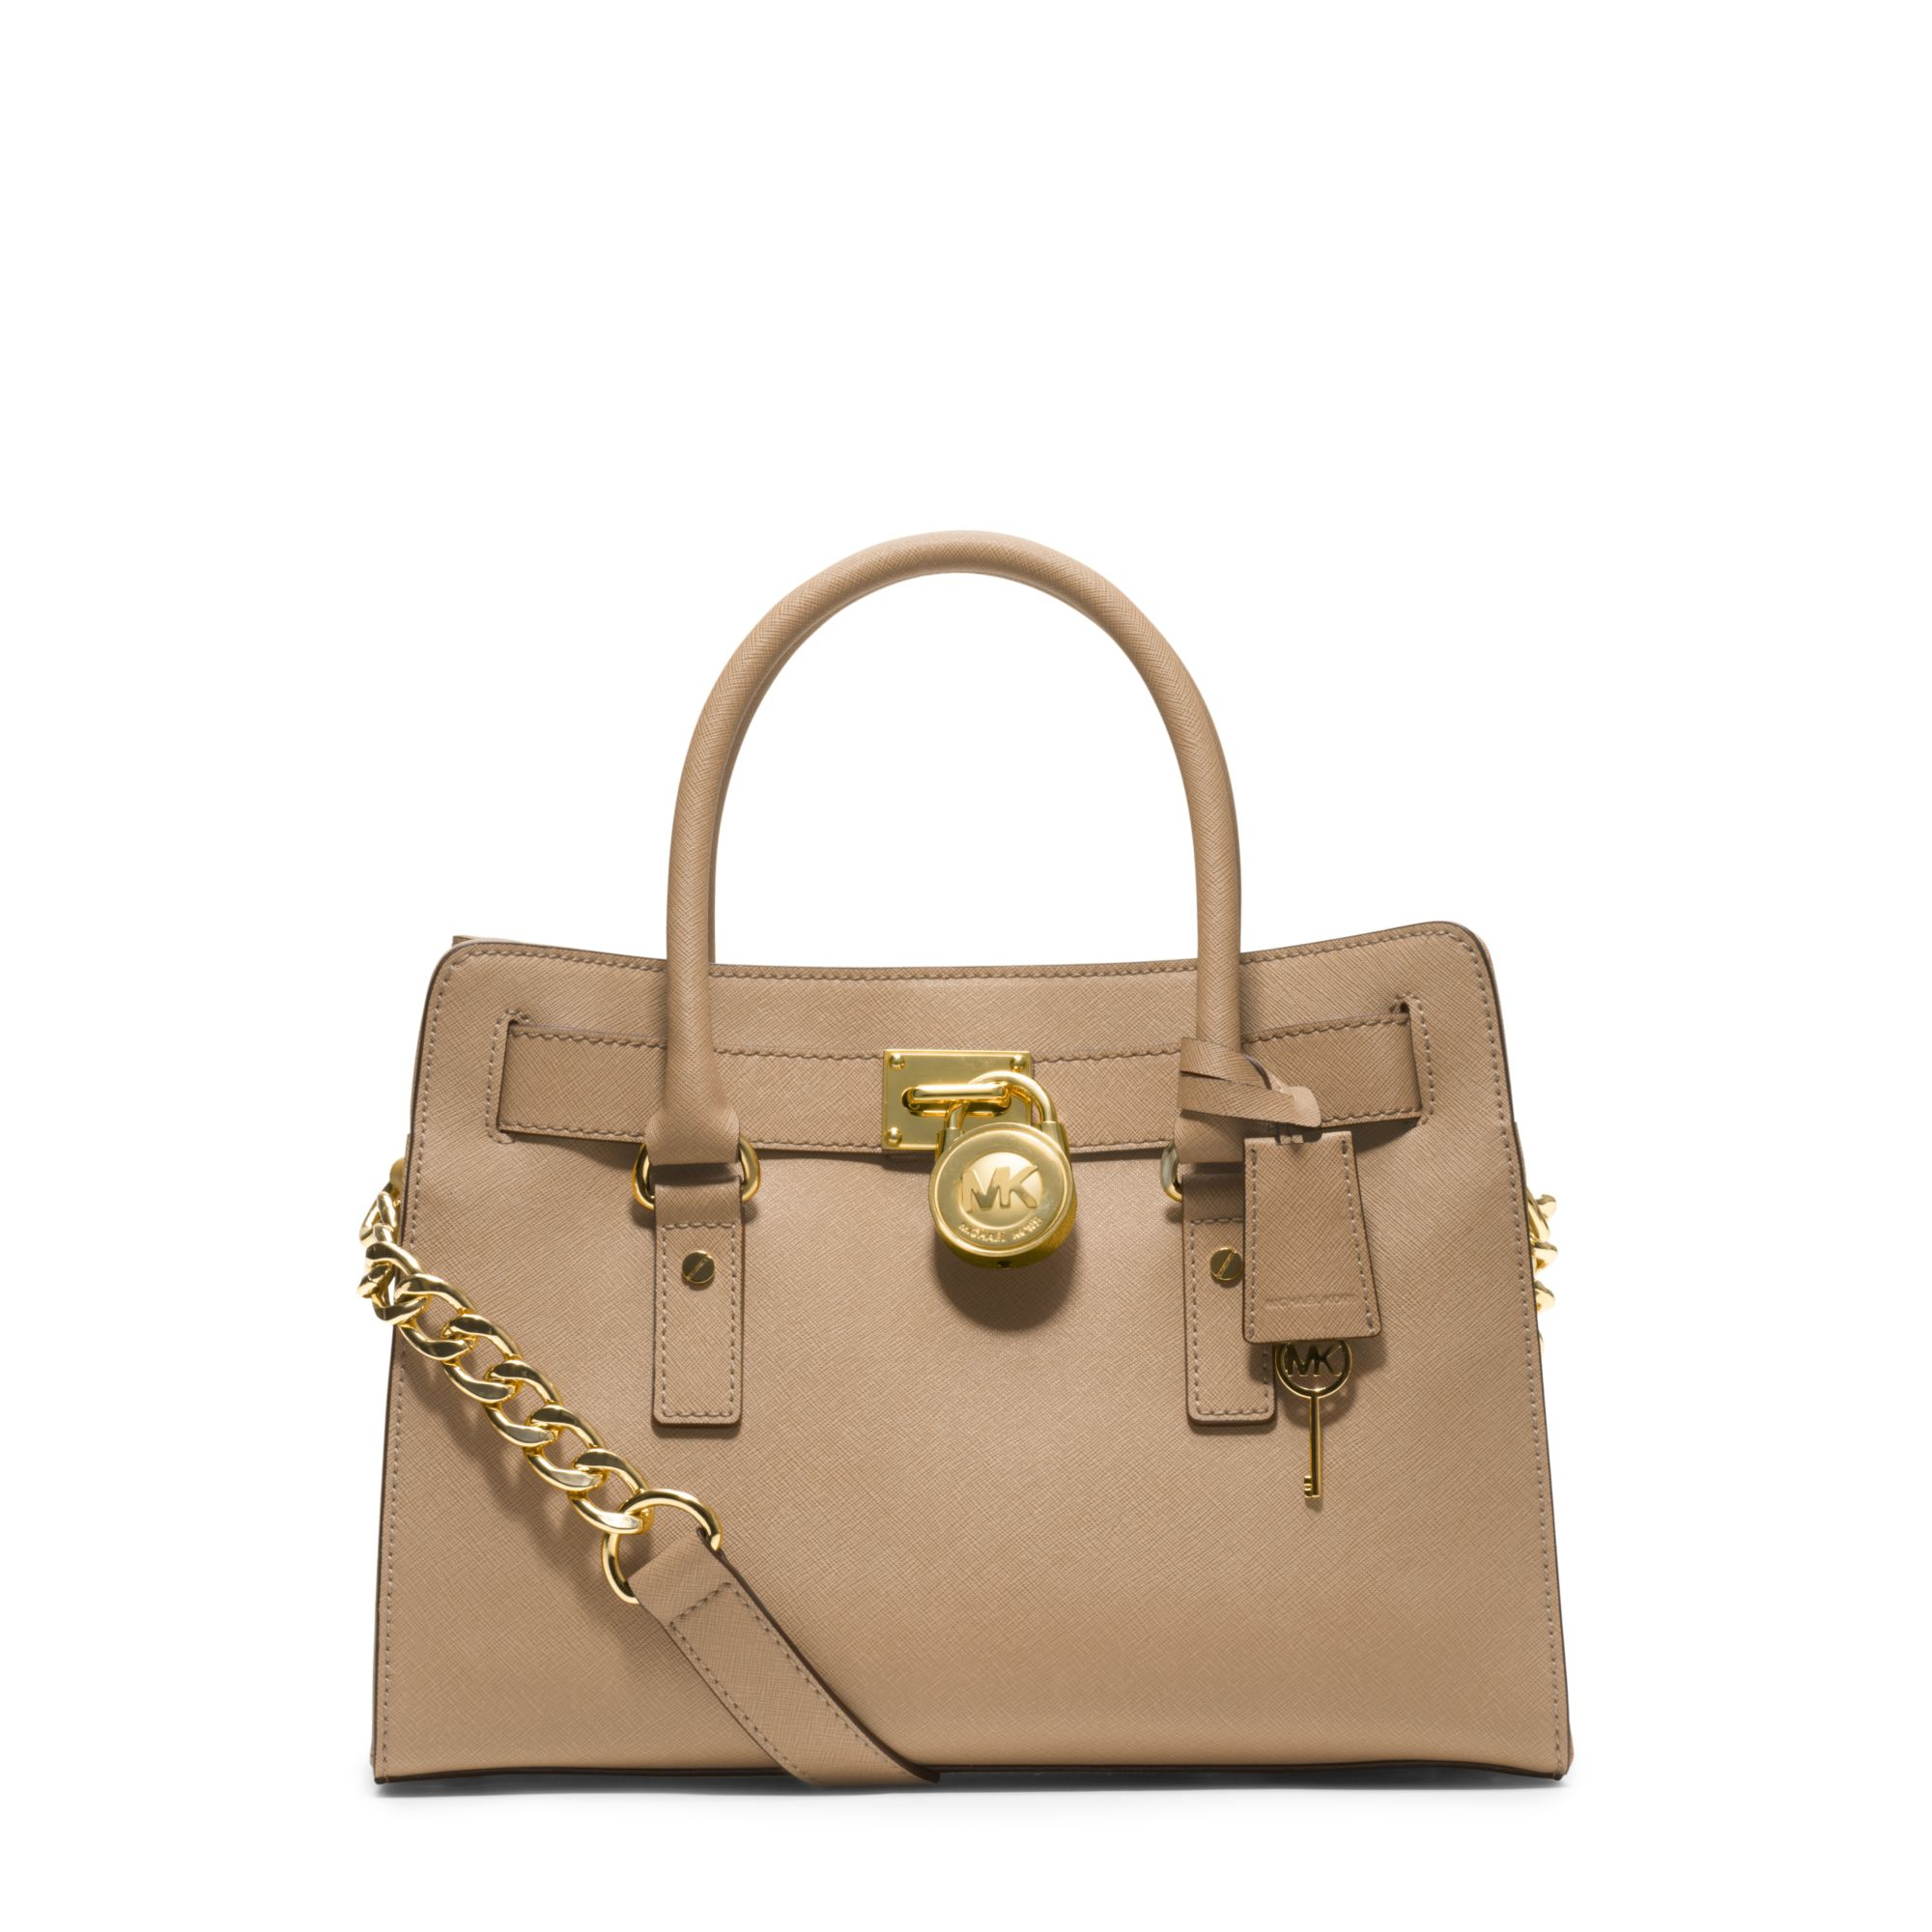 7a1bf49df3 ... netherlands lyst michael kors hamilton saffiano leather medium satchel  in natural 834fc dbe9d